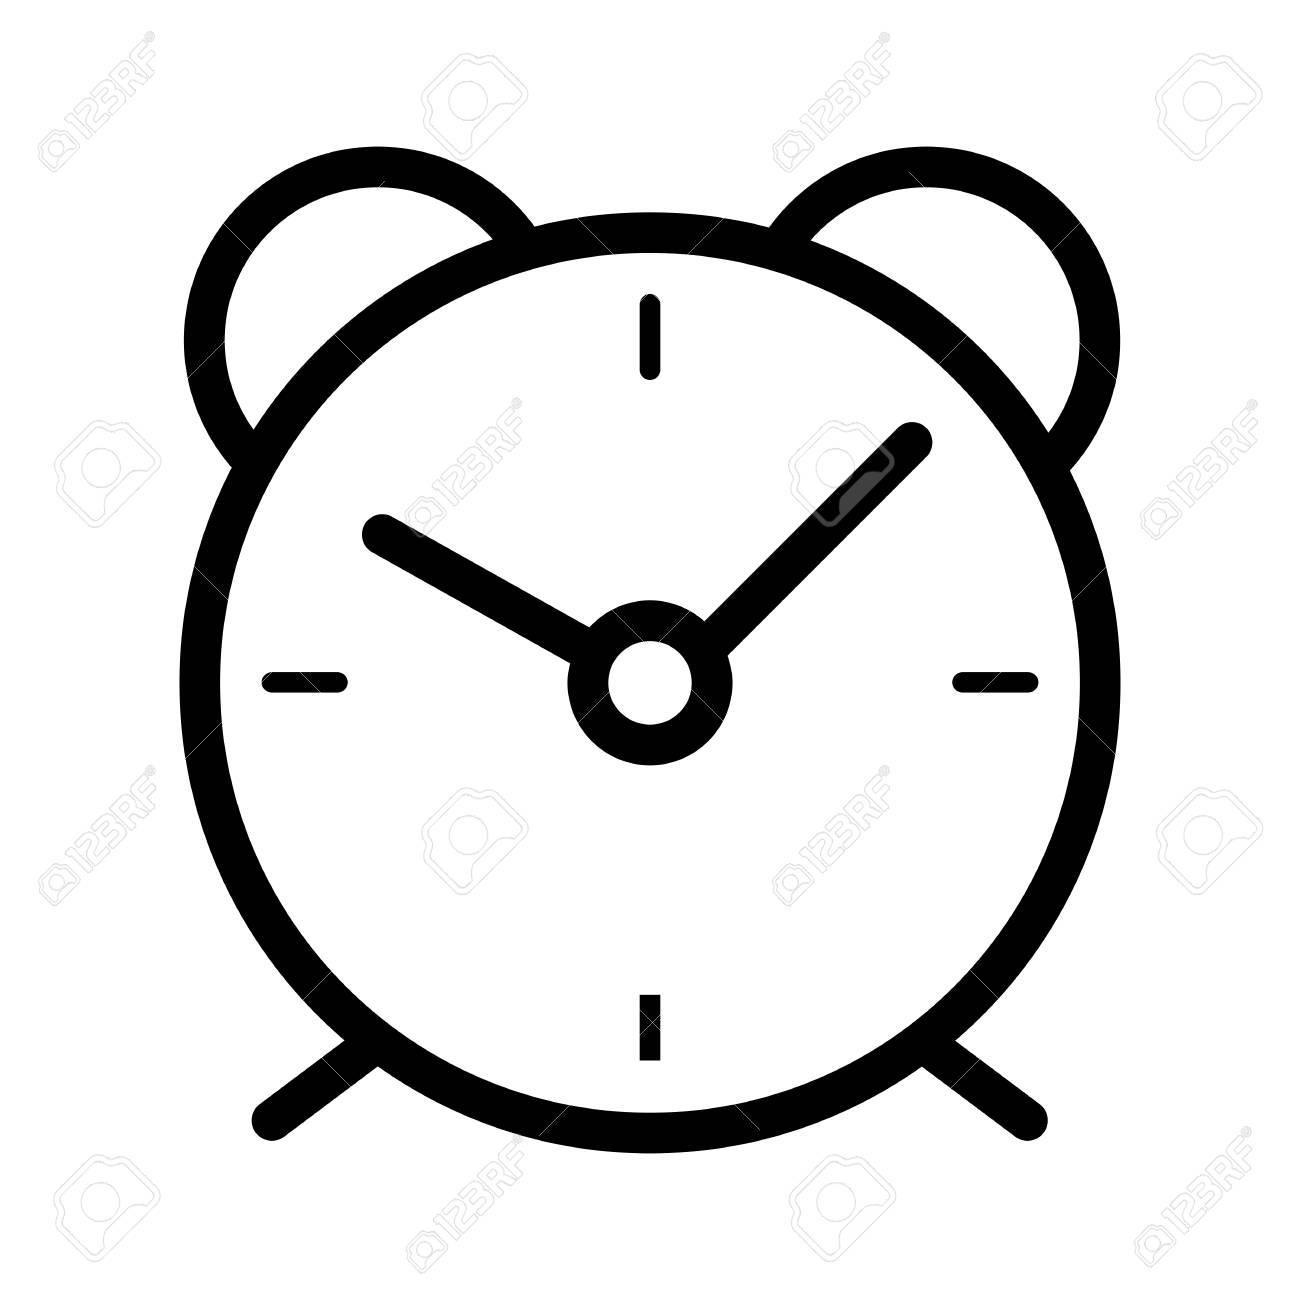 alarm clock simple vector icon black and white illustration rh 123rf com